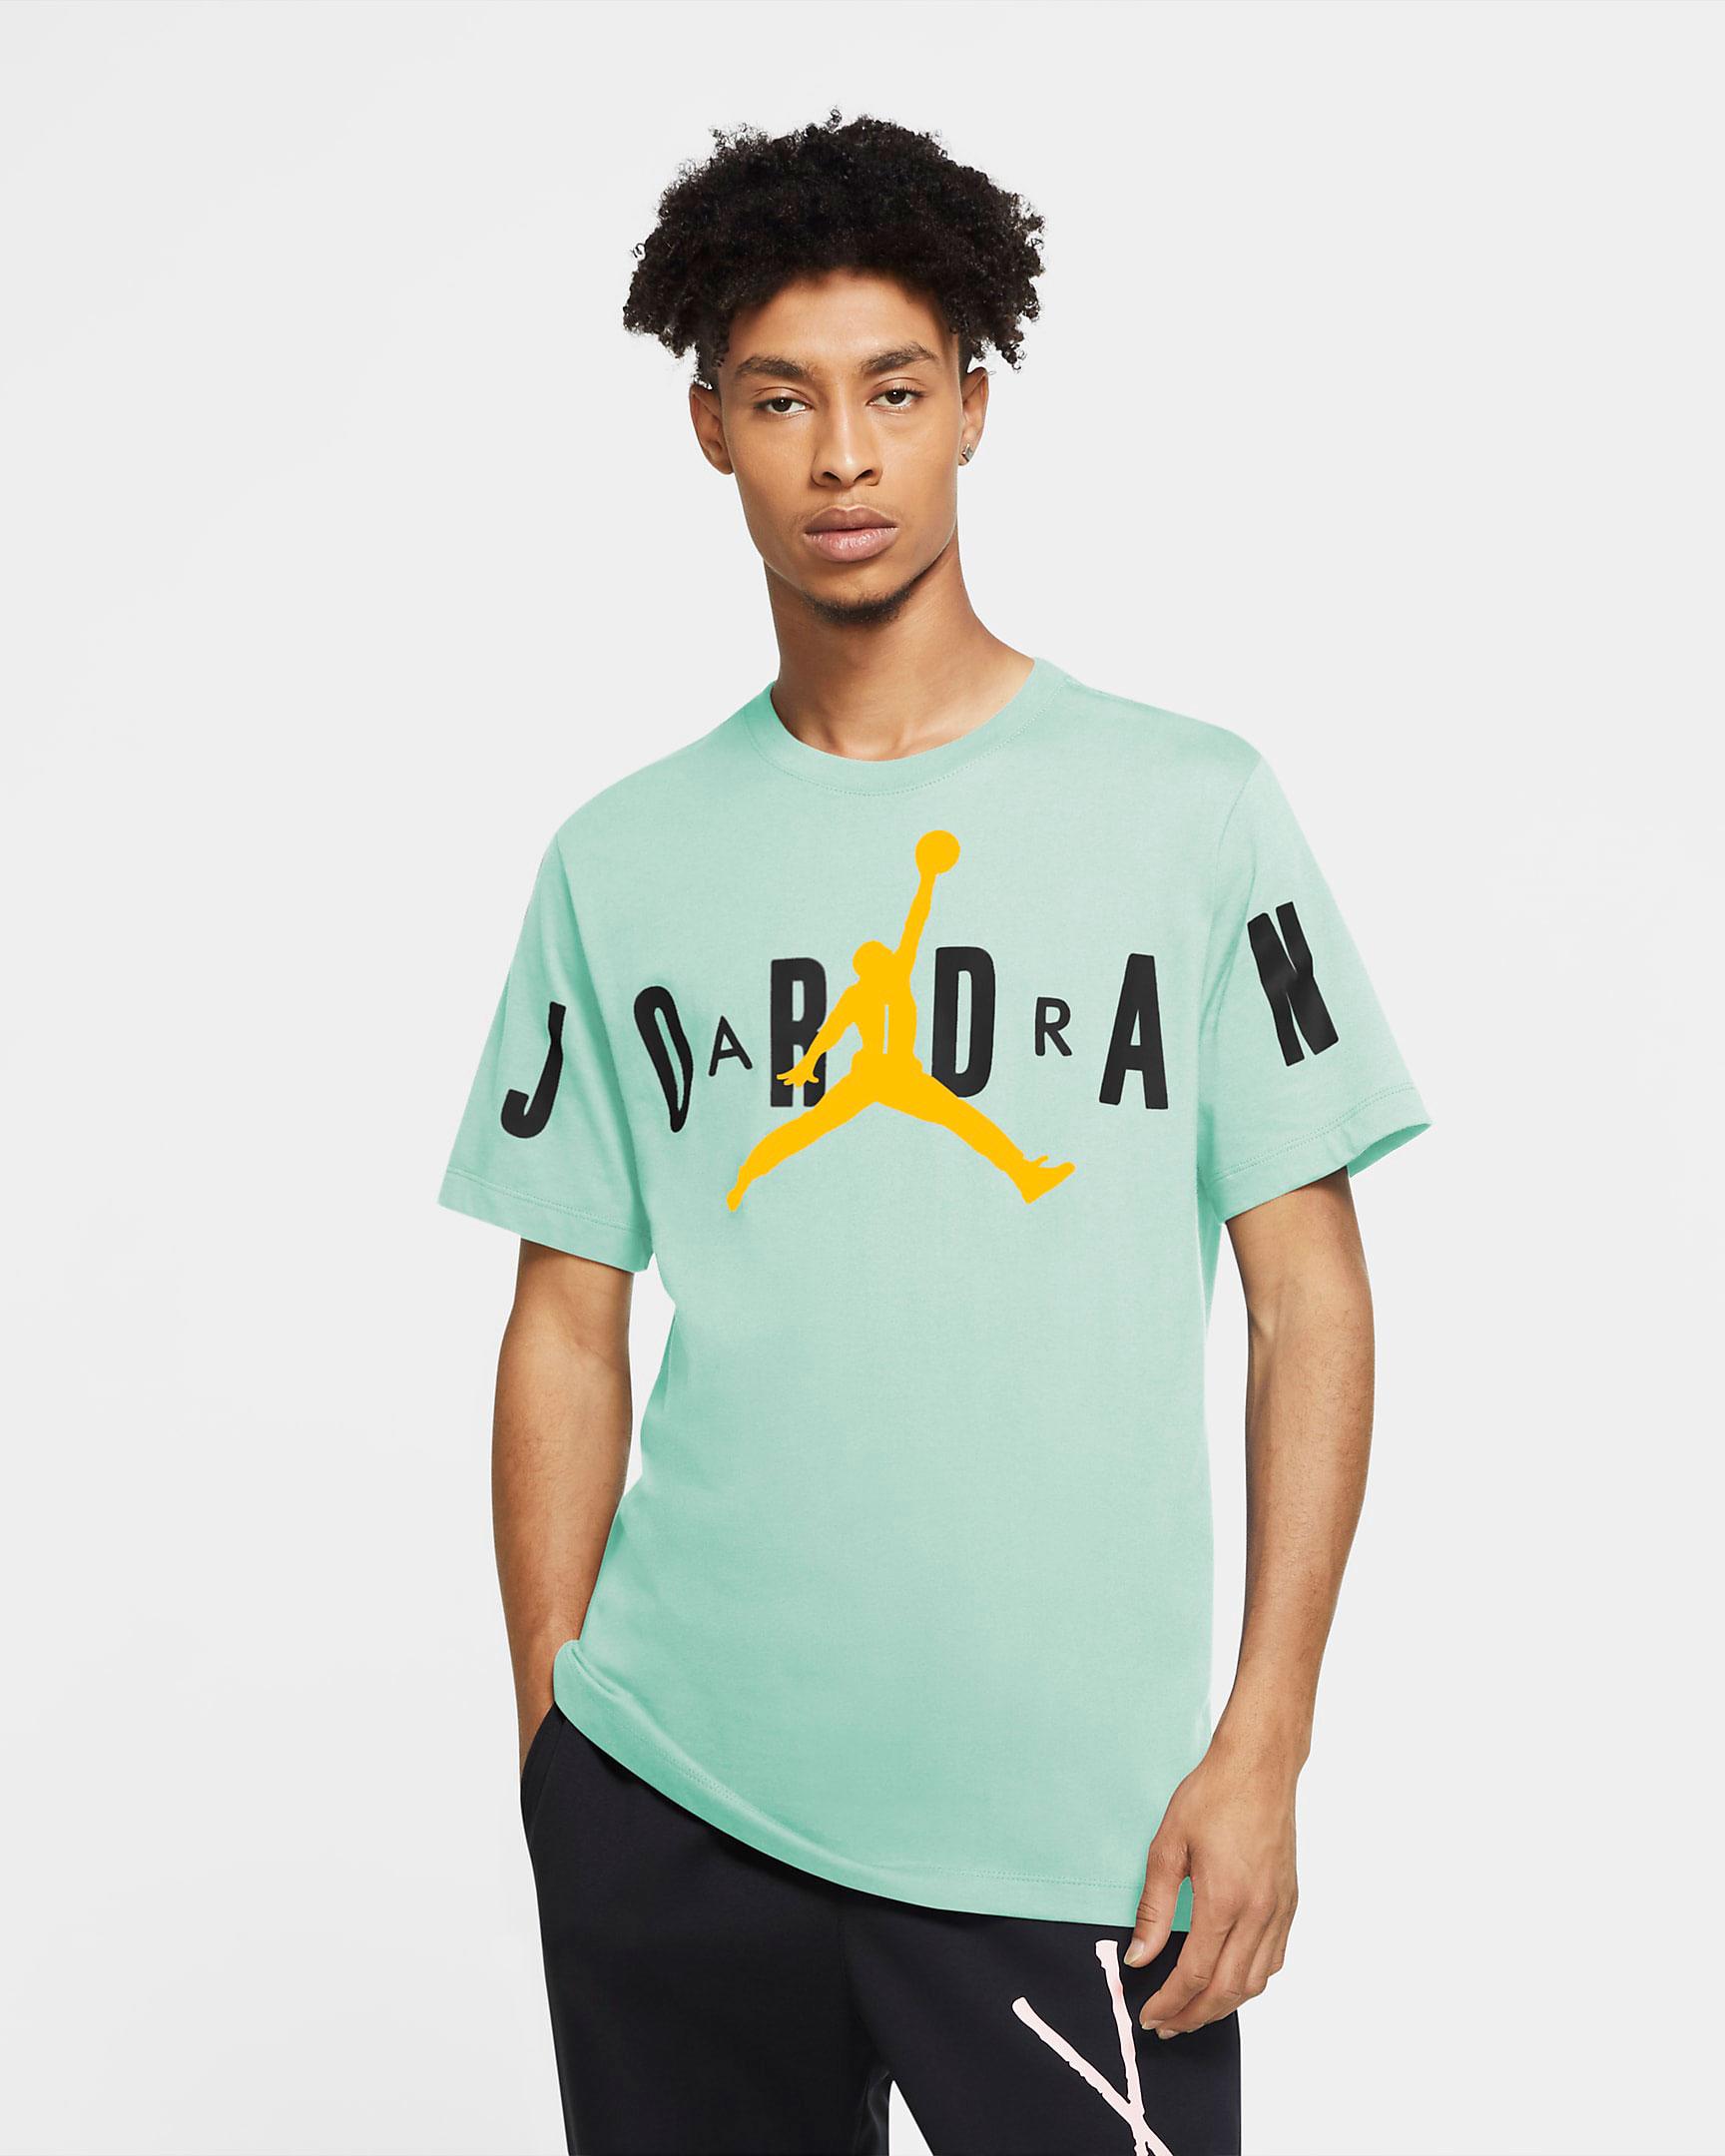 air-jordan-1-bio-hack-shirt-match-2